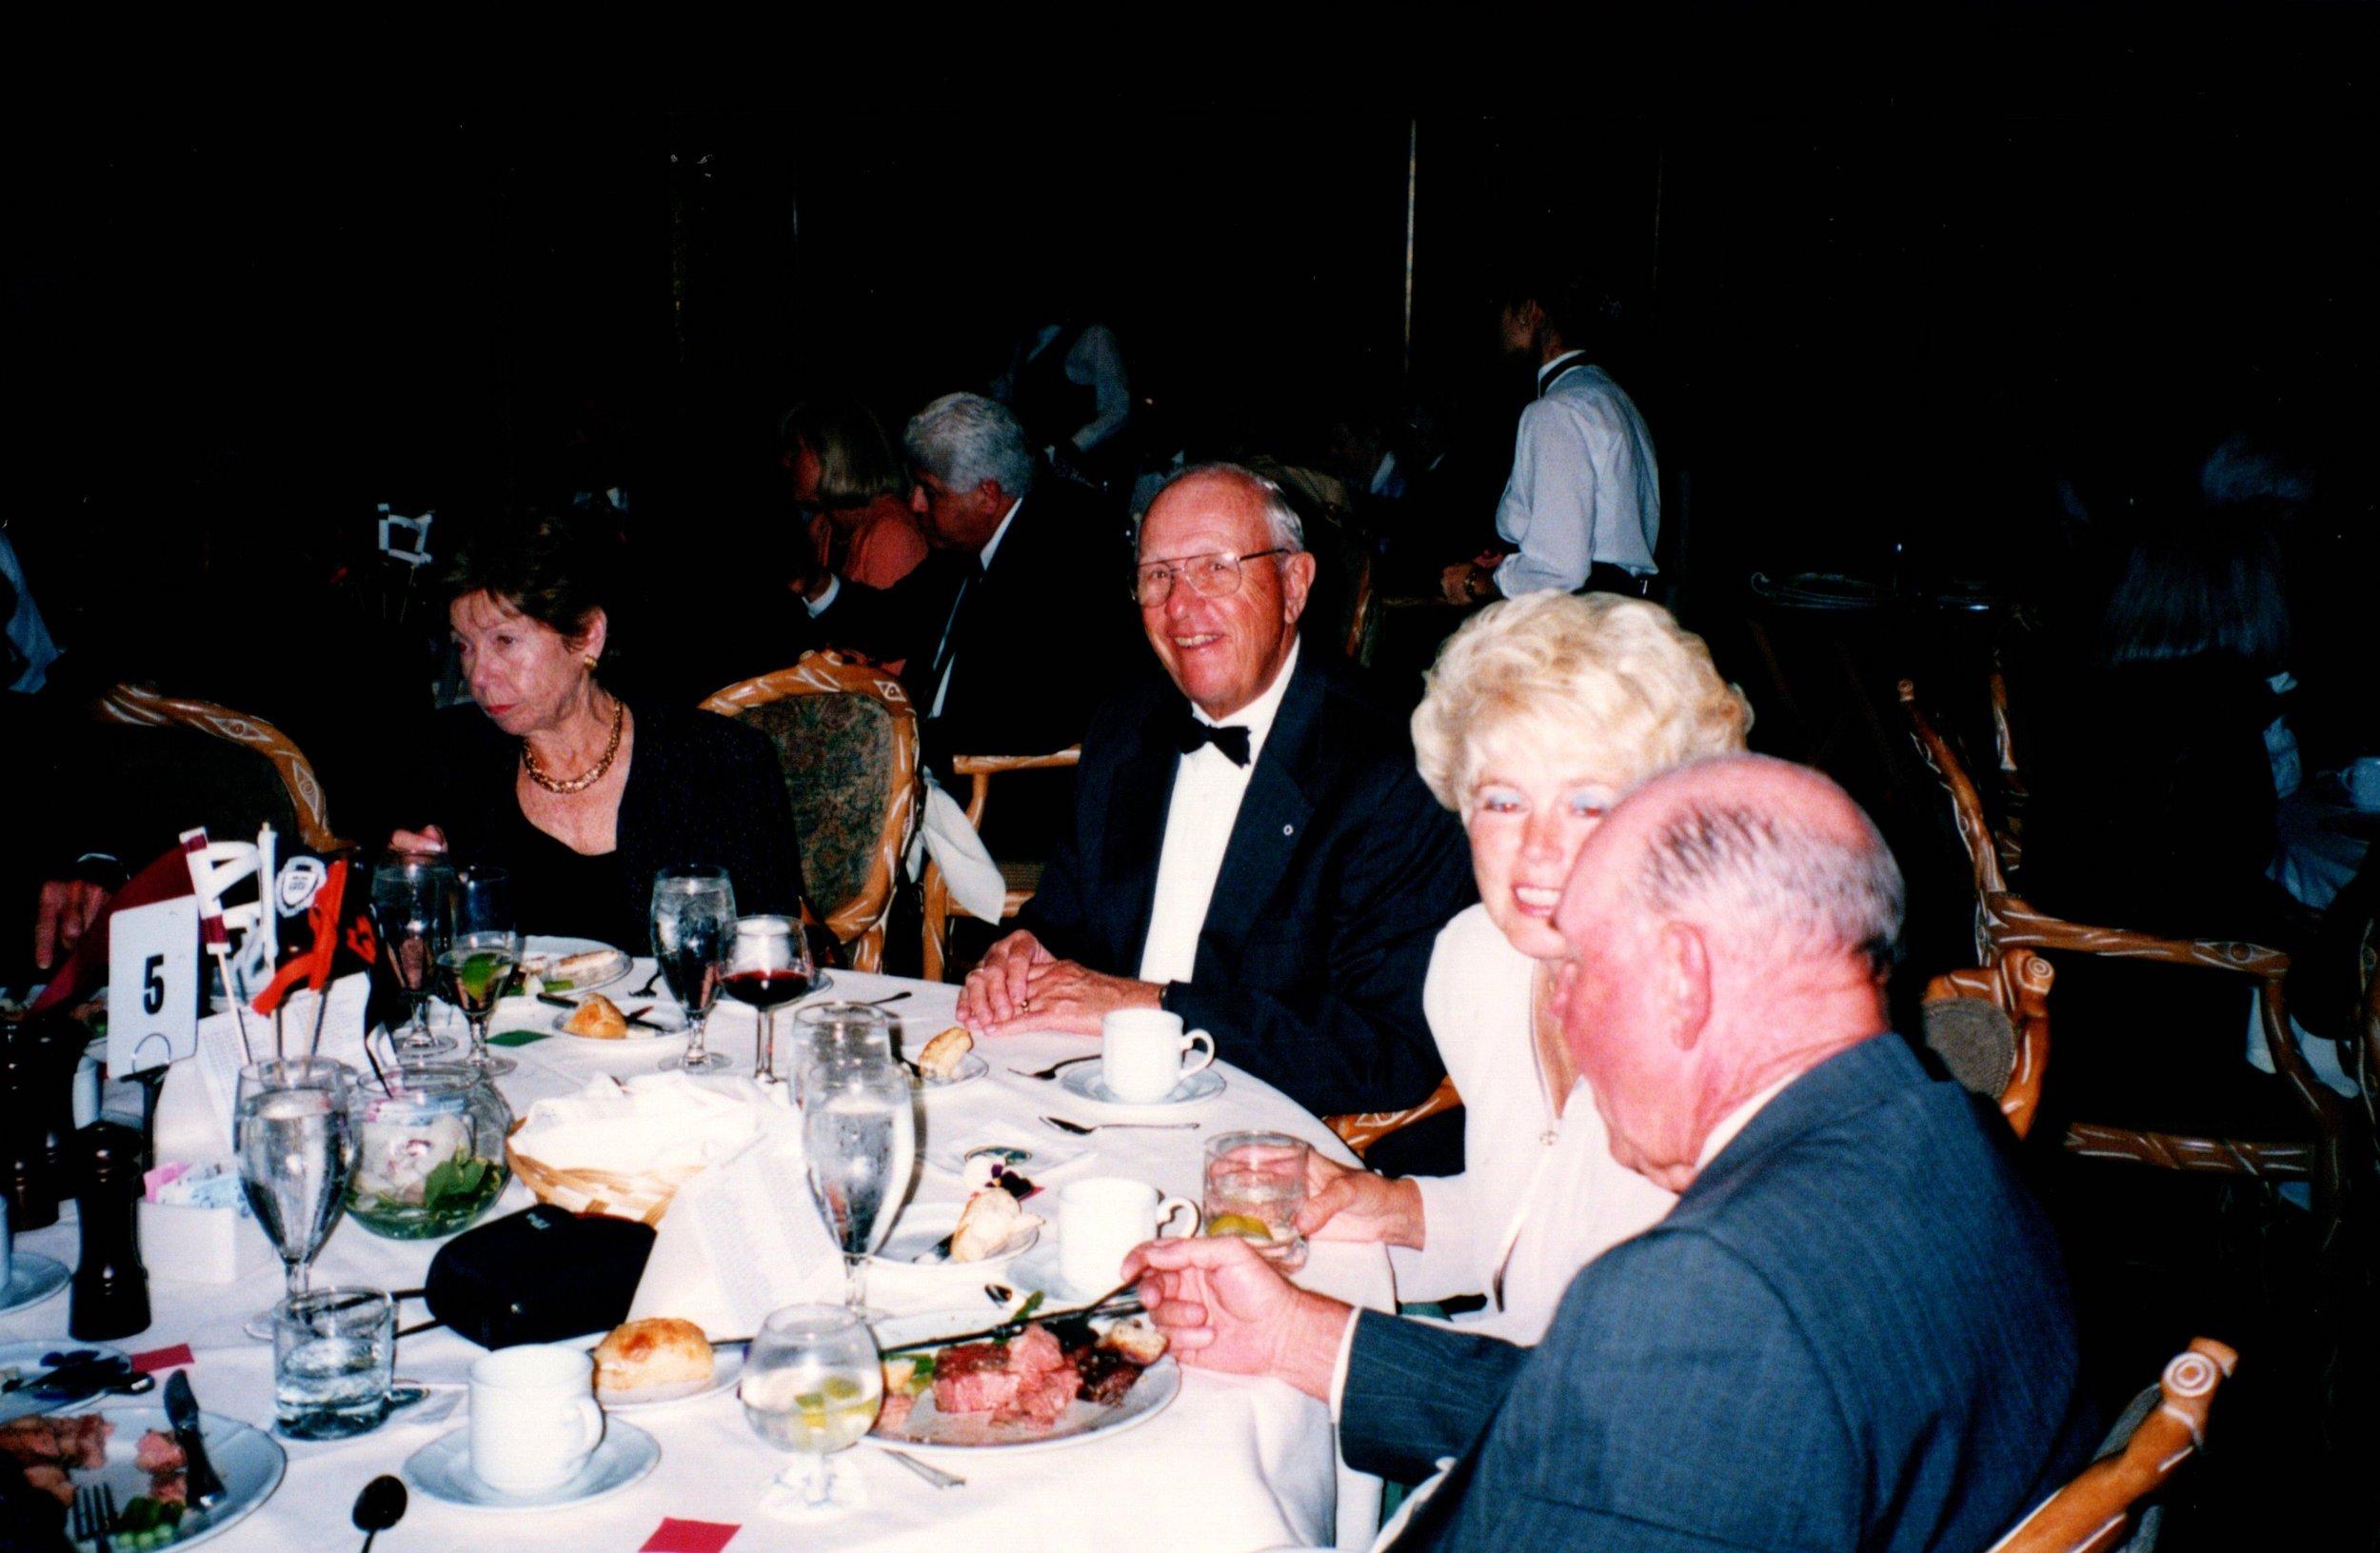 2_11_2002 - HYP DINNER DANCE - VINEYARD COUNTRY CLUB 10.jpg